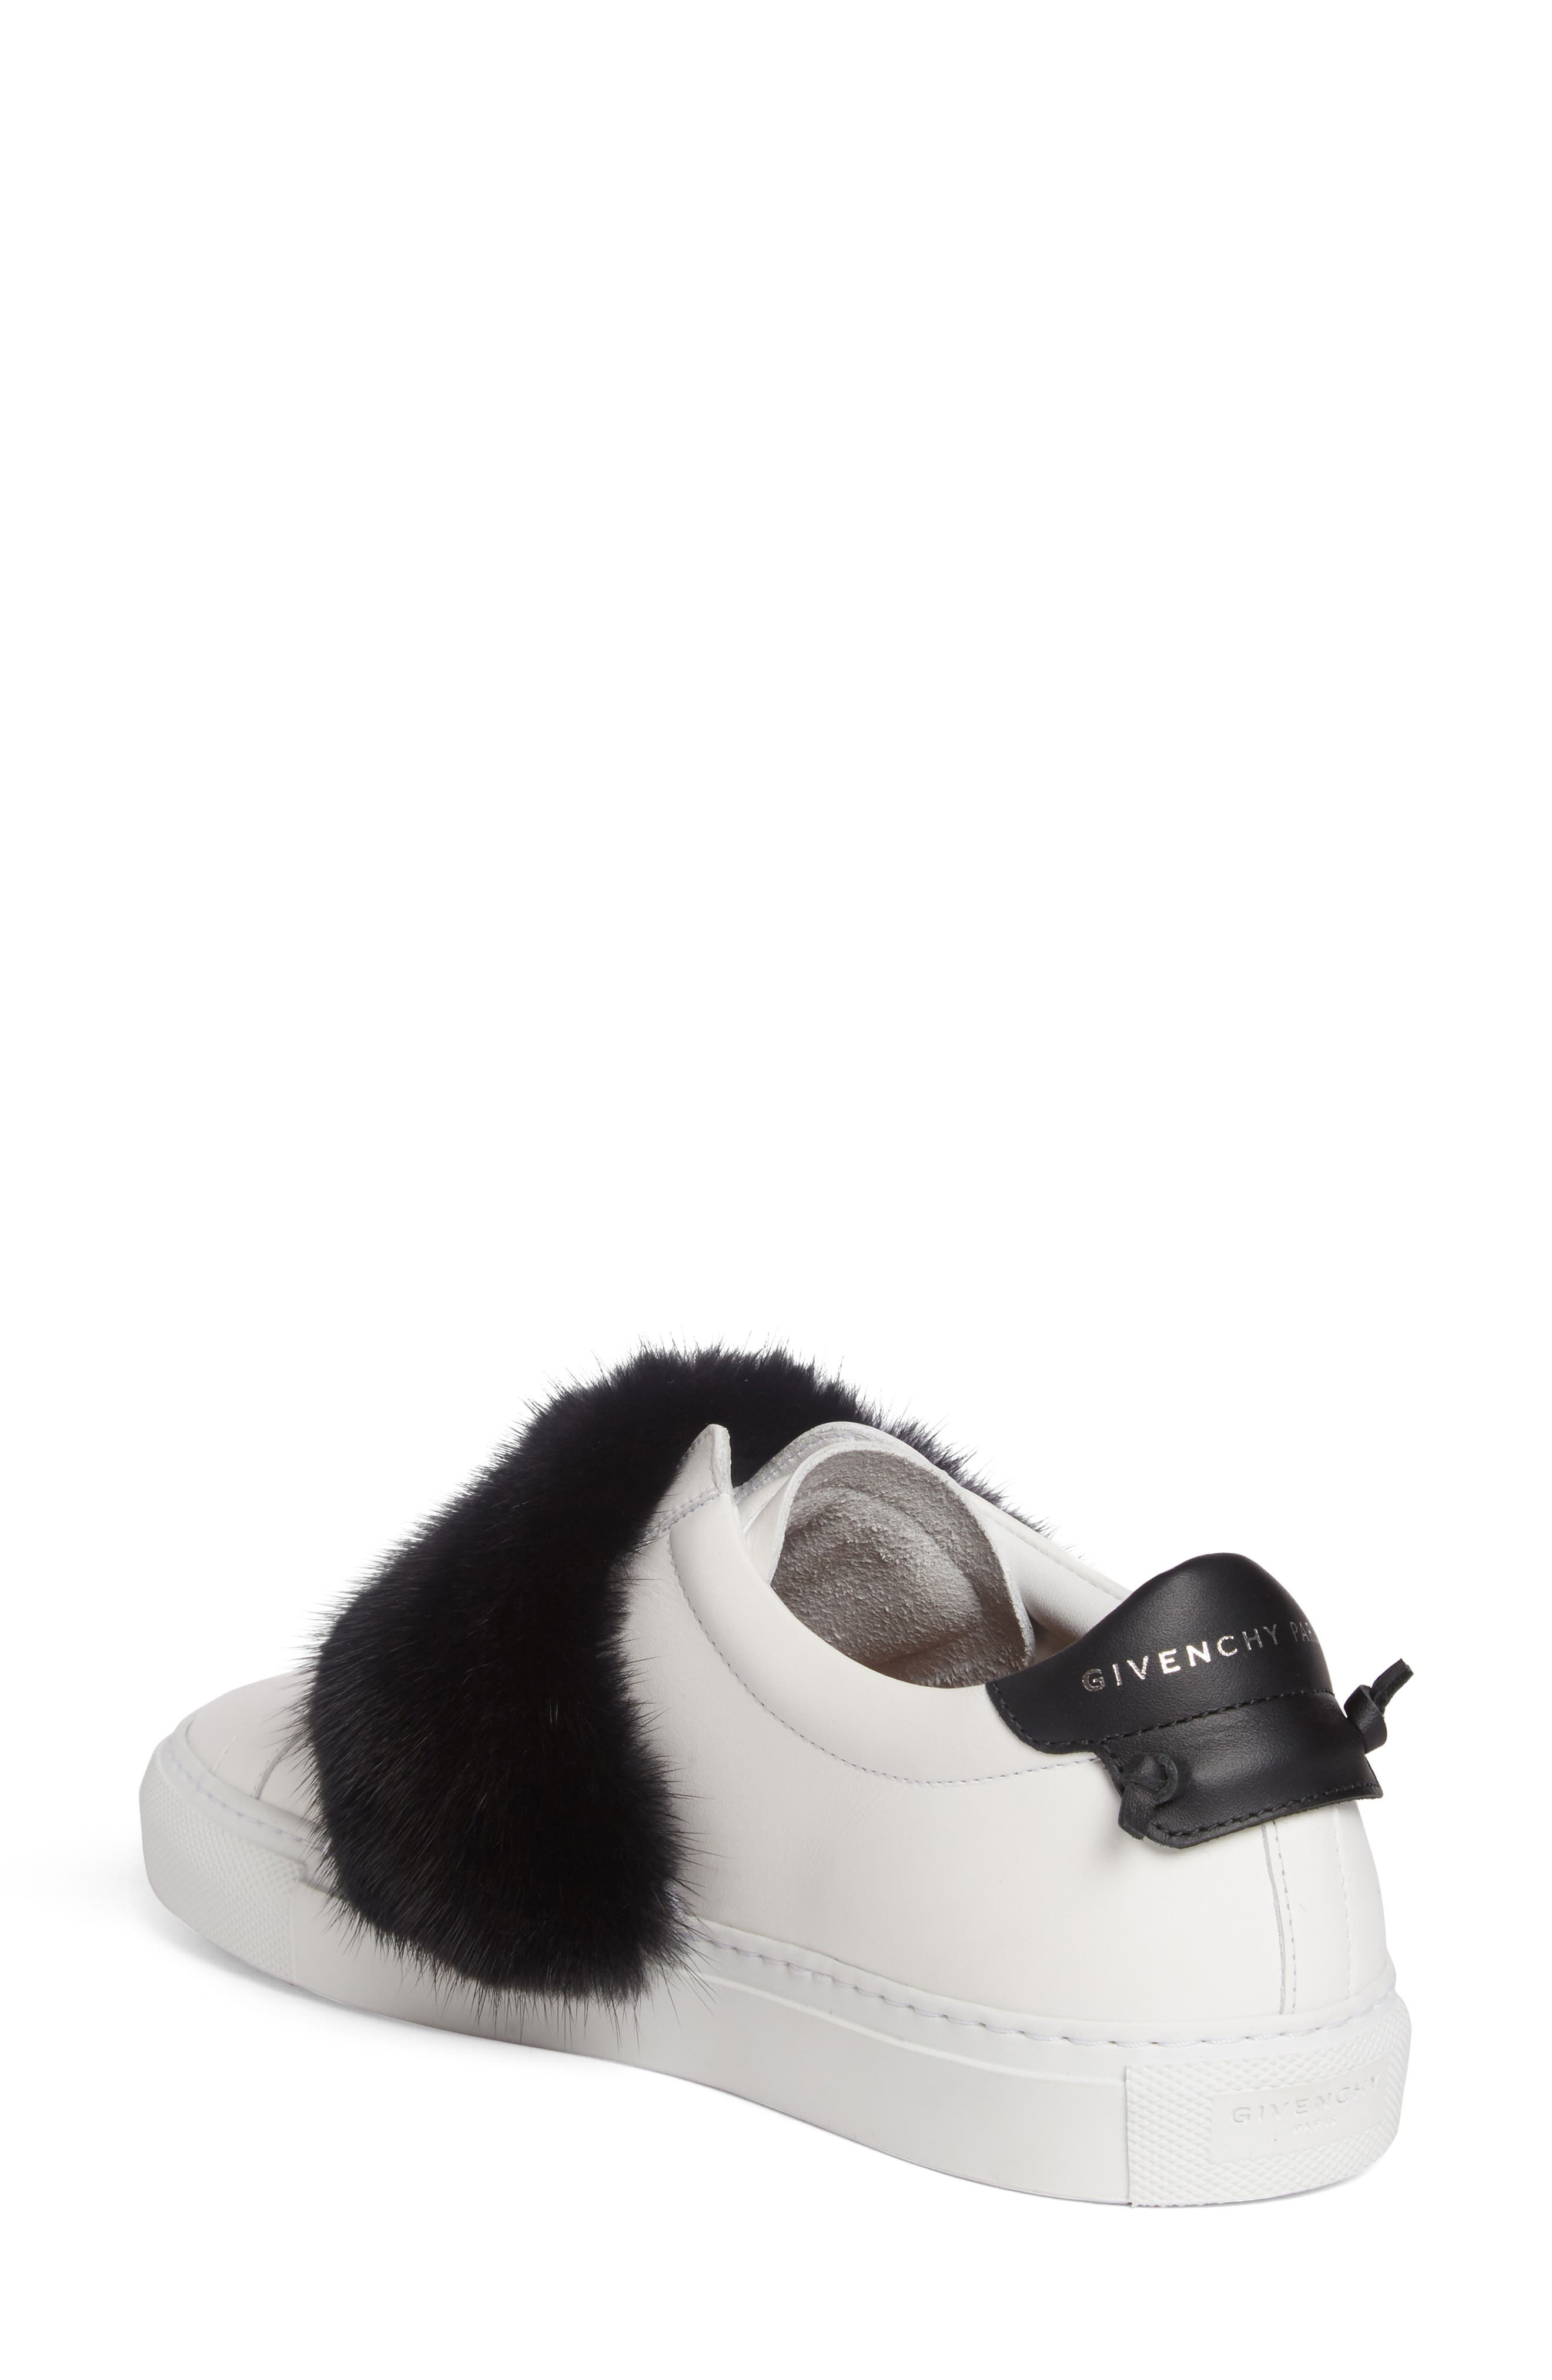 Urban Street Slip-On Sneaker with Genuine Mink Fur Trim,                             Alternate thumbnail 8, color,